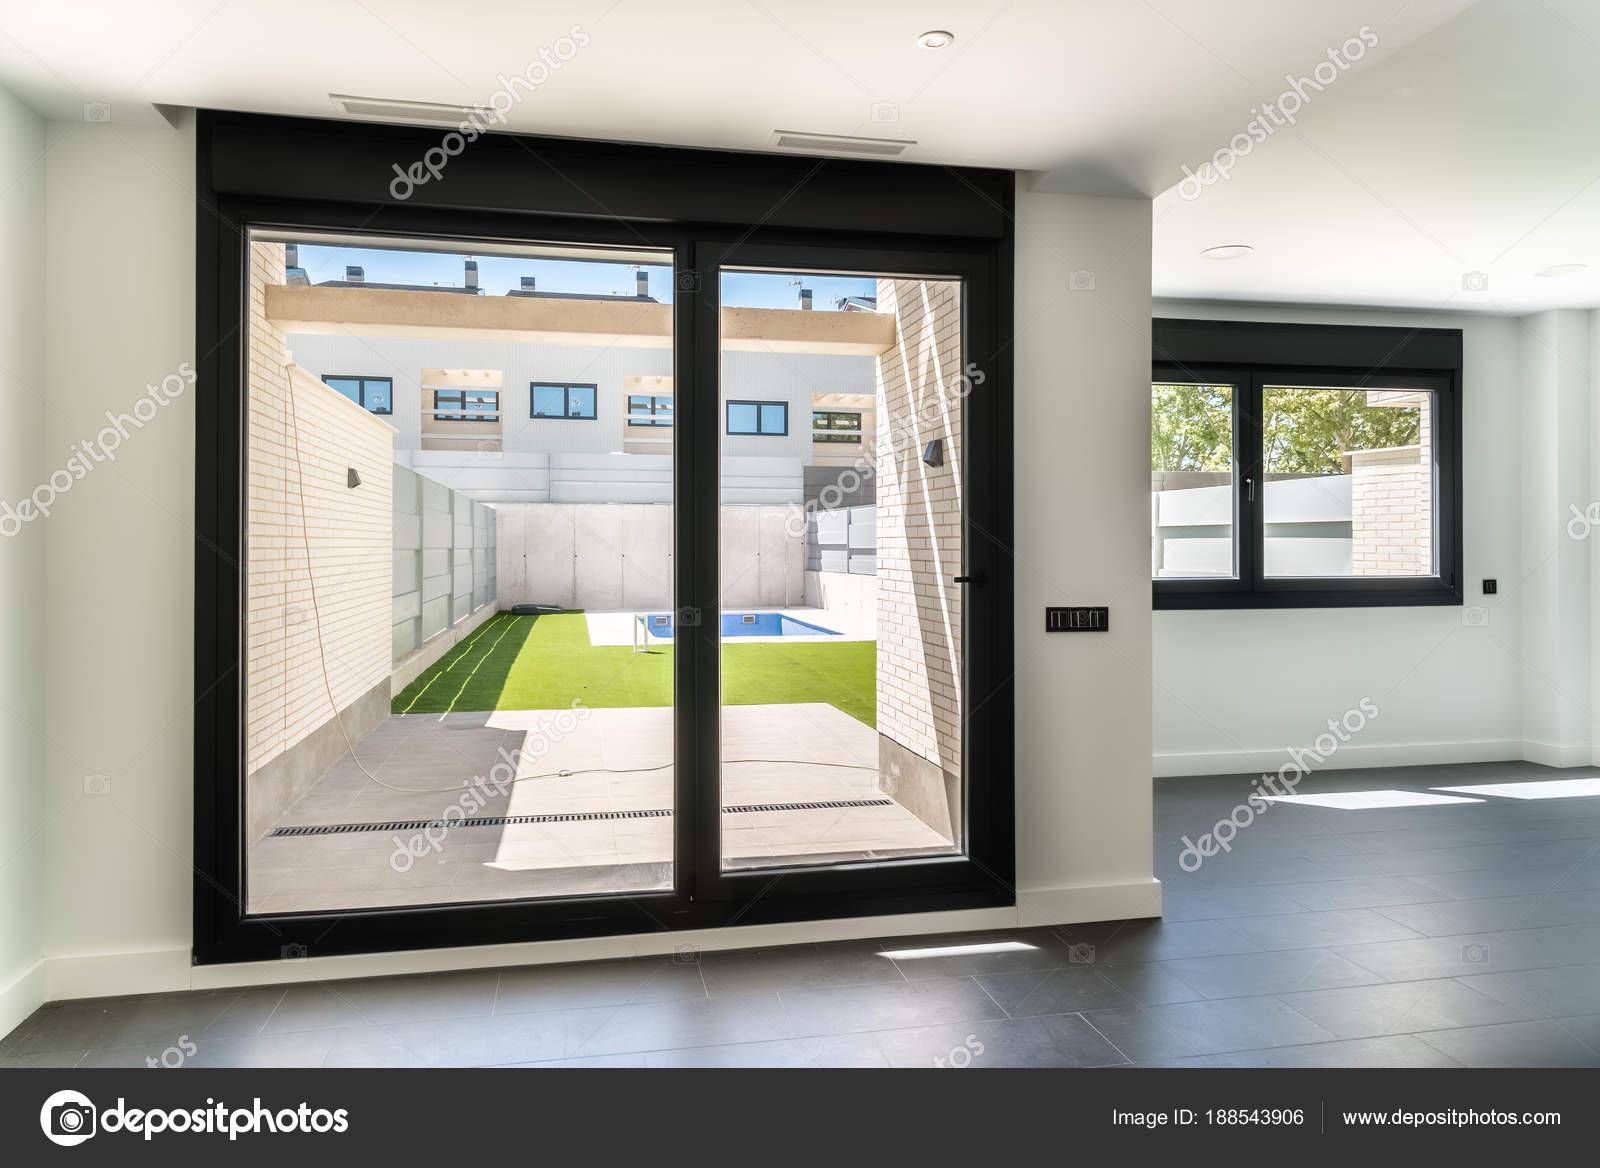 Moderne architectuur huis interieur u stockfoto jjfarquitectos